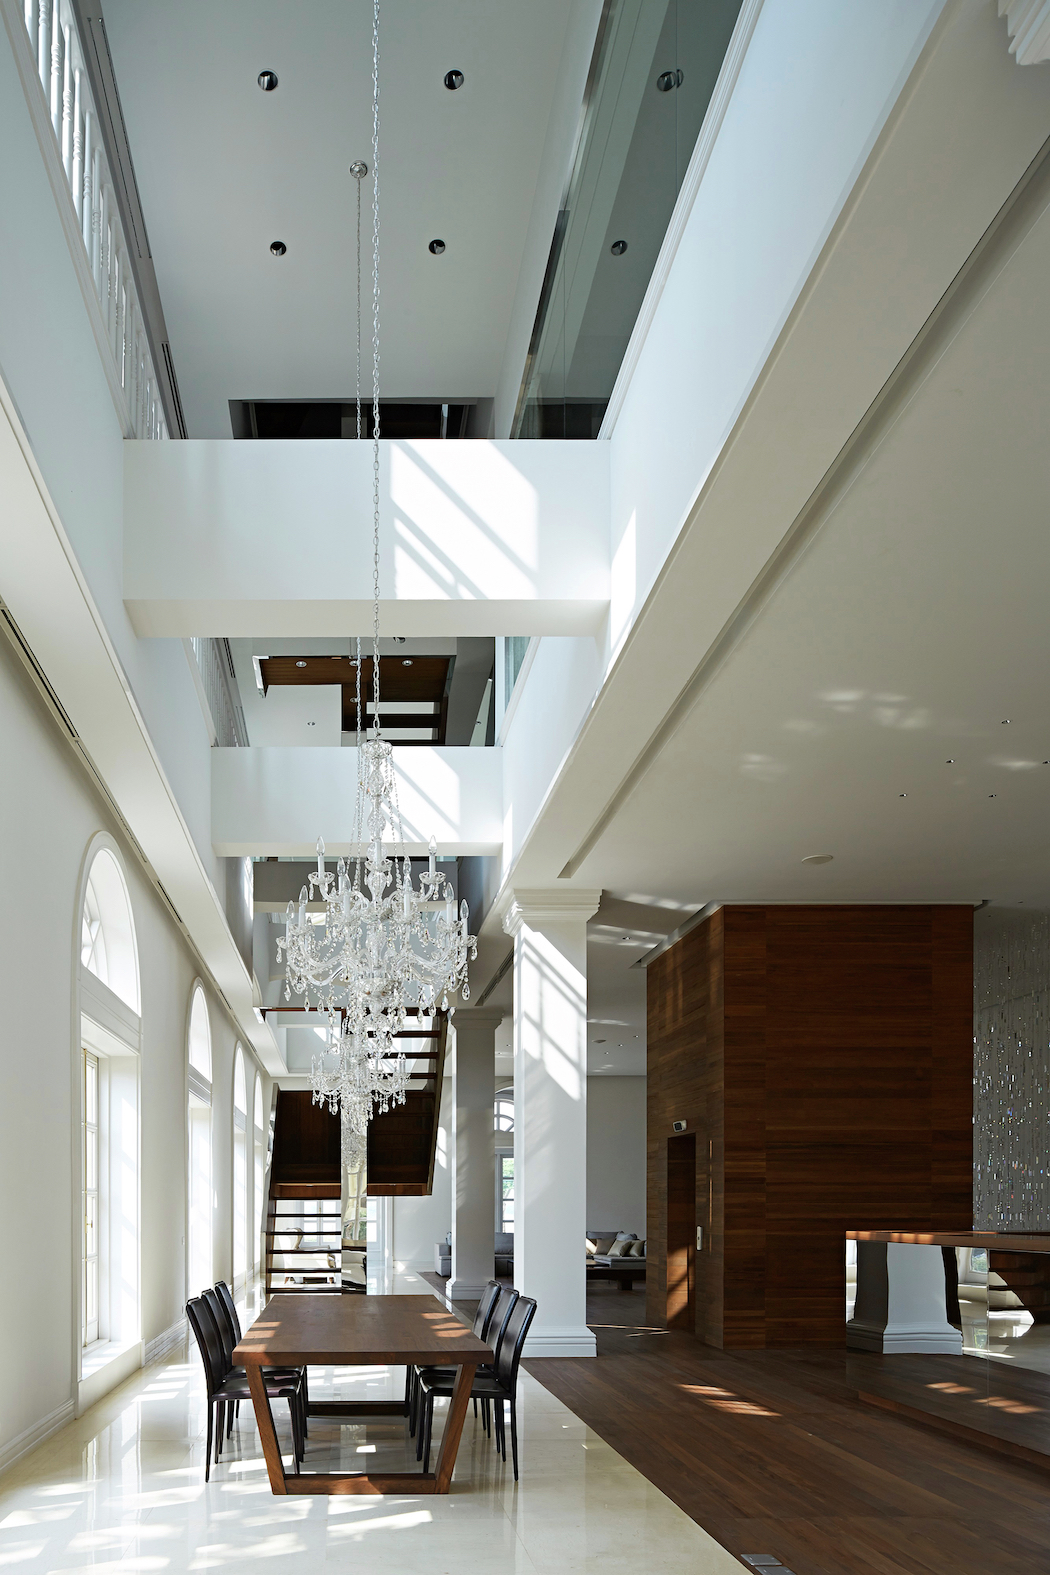 House in Pakse : Makoto Yamaguchi Design 1